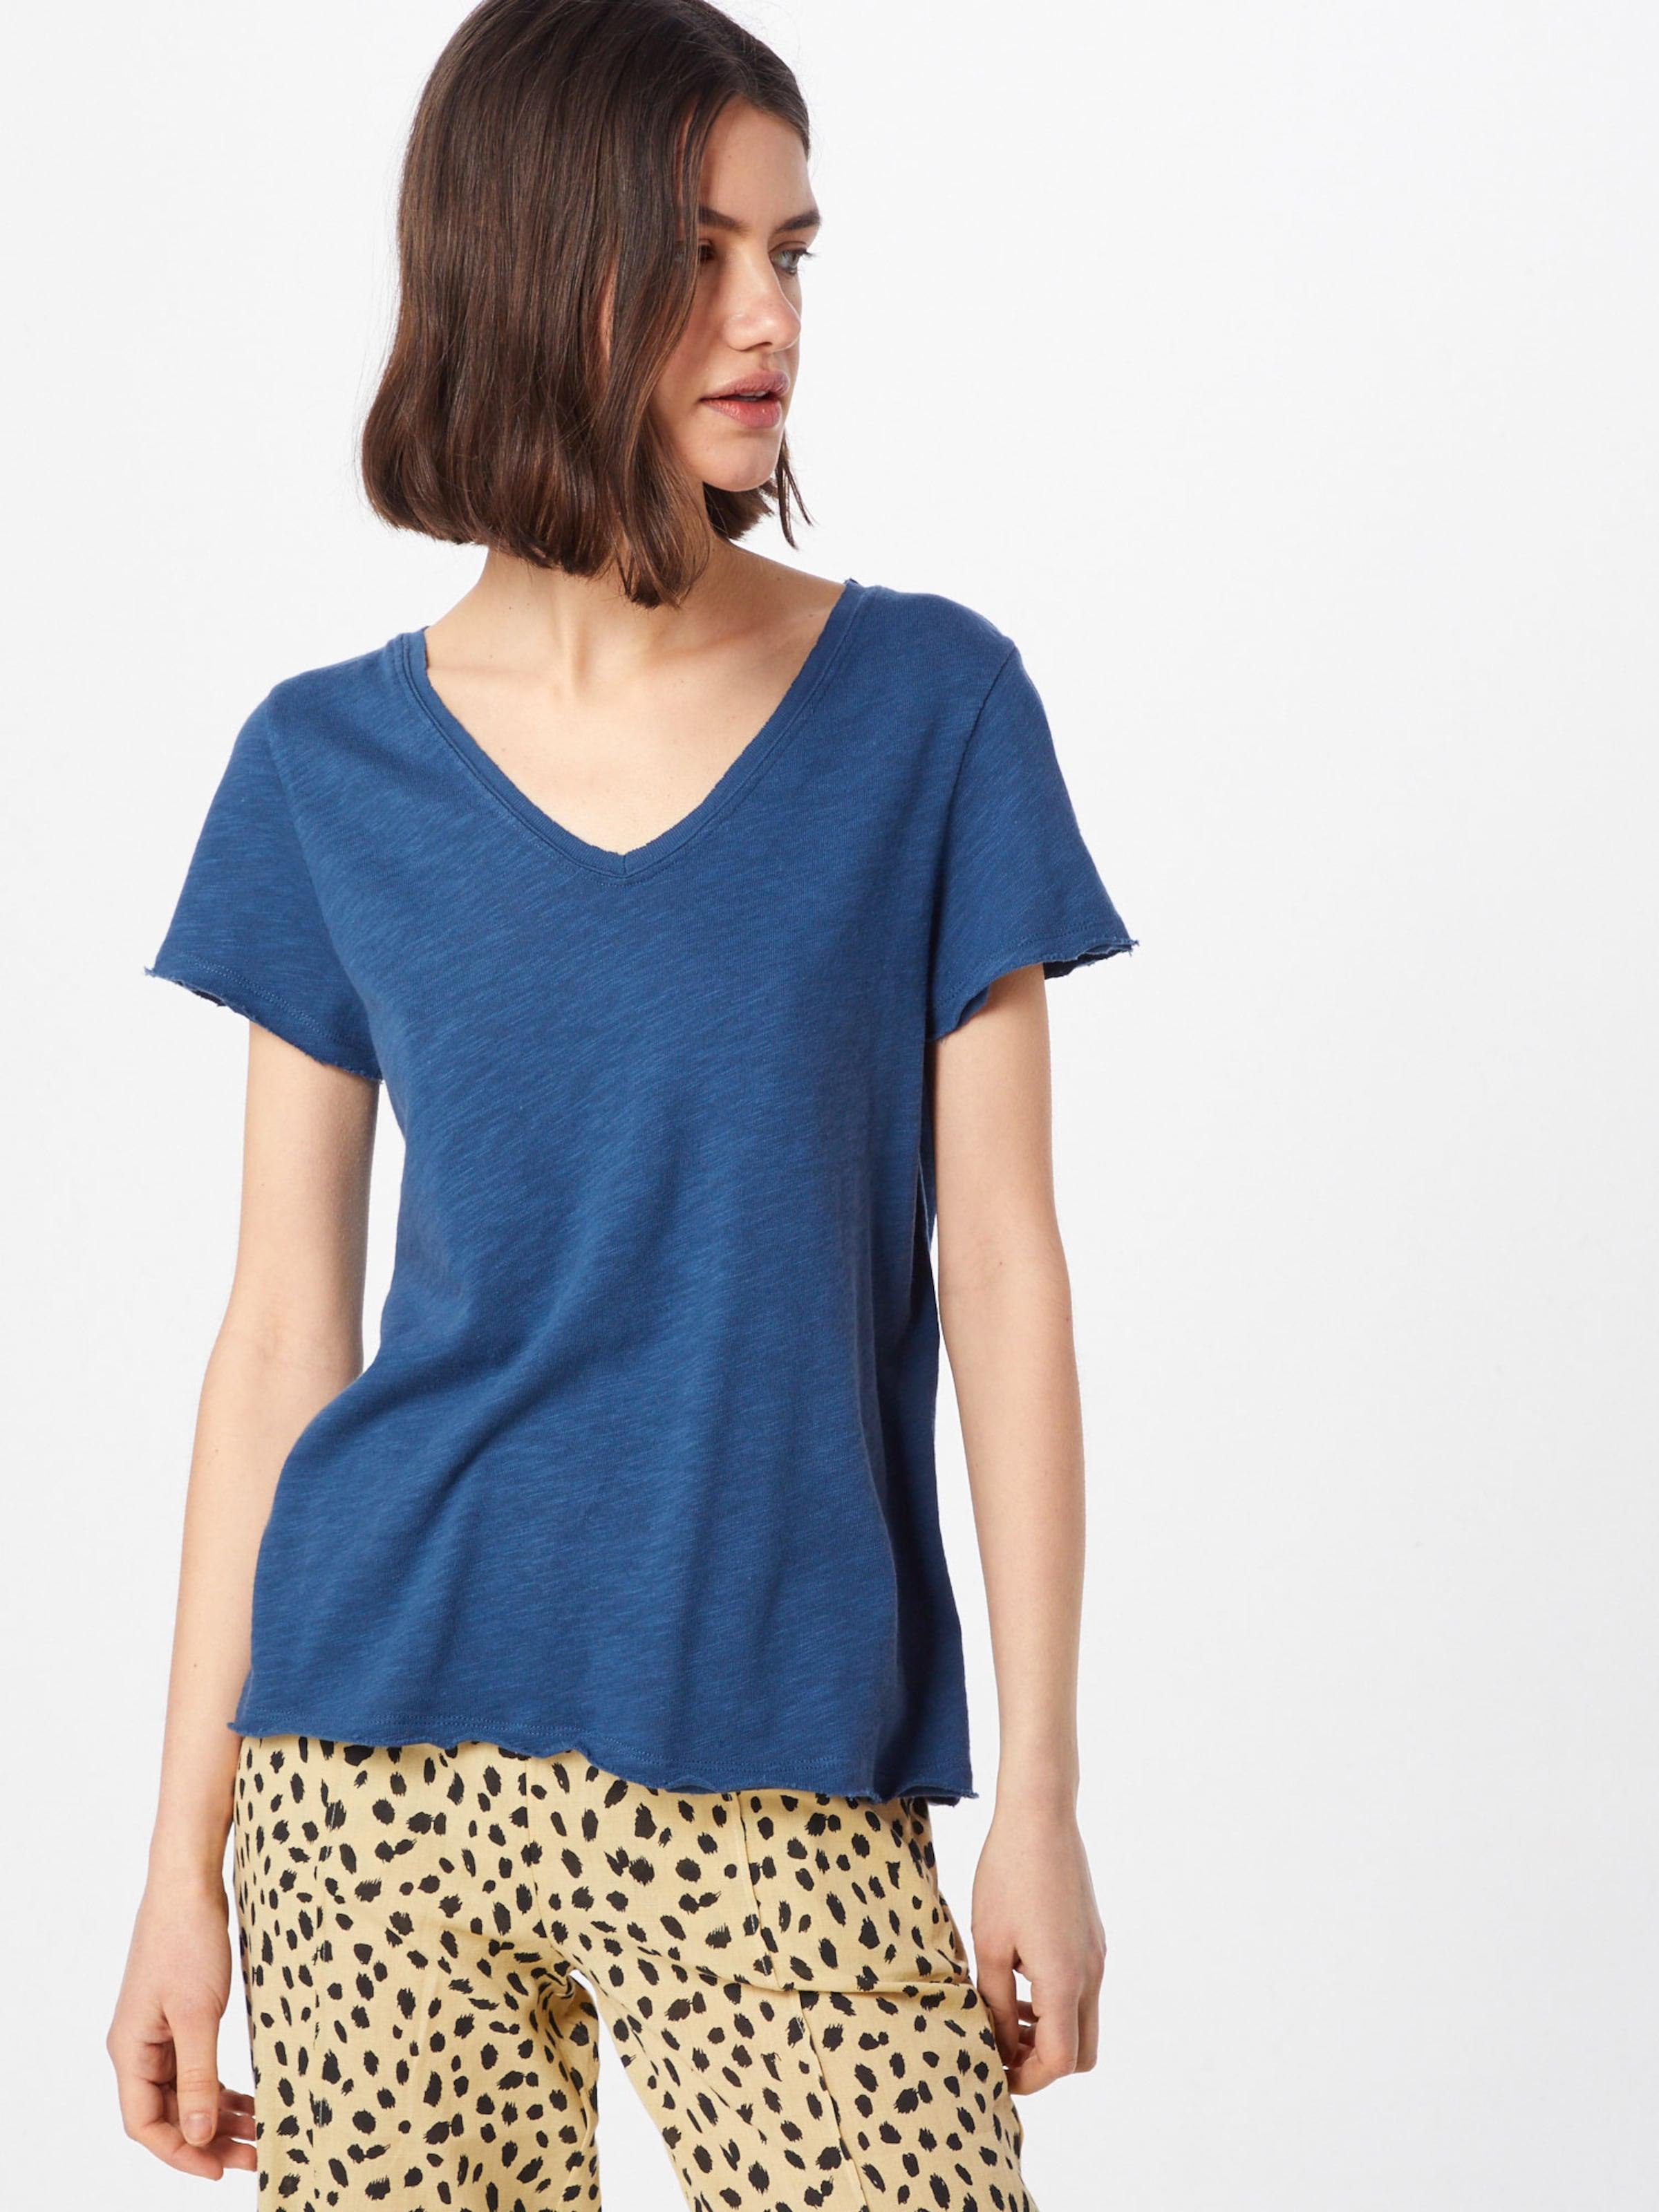 T 'sonoma' En Bleu Vintage American shirt WD2YeEH9I